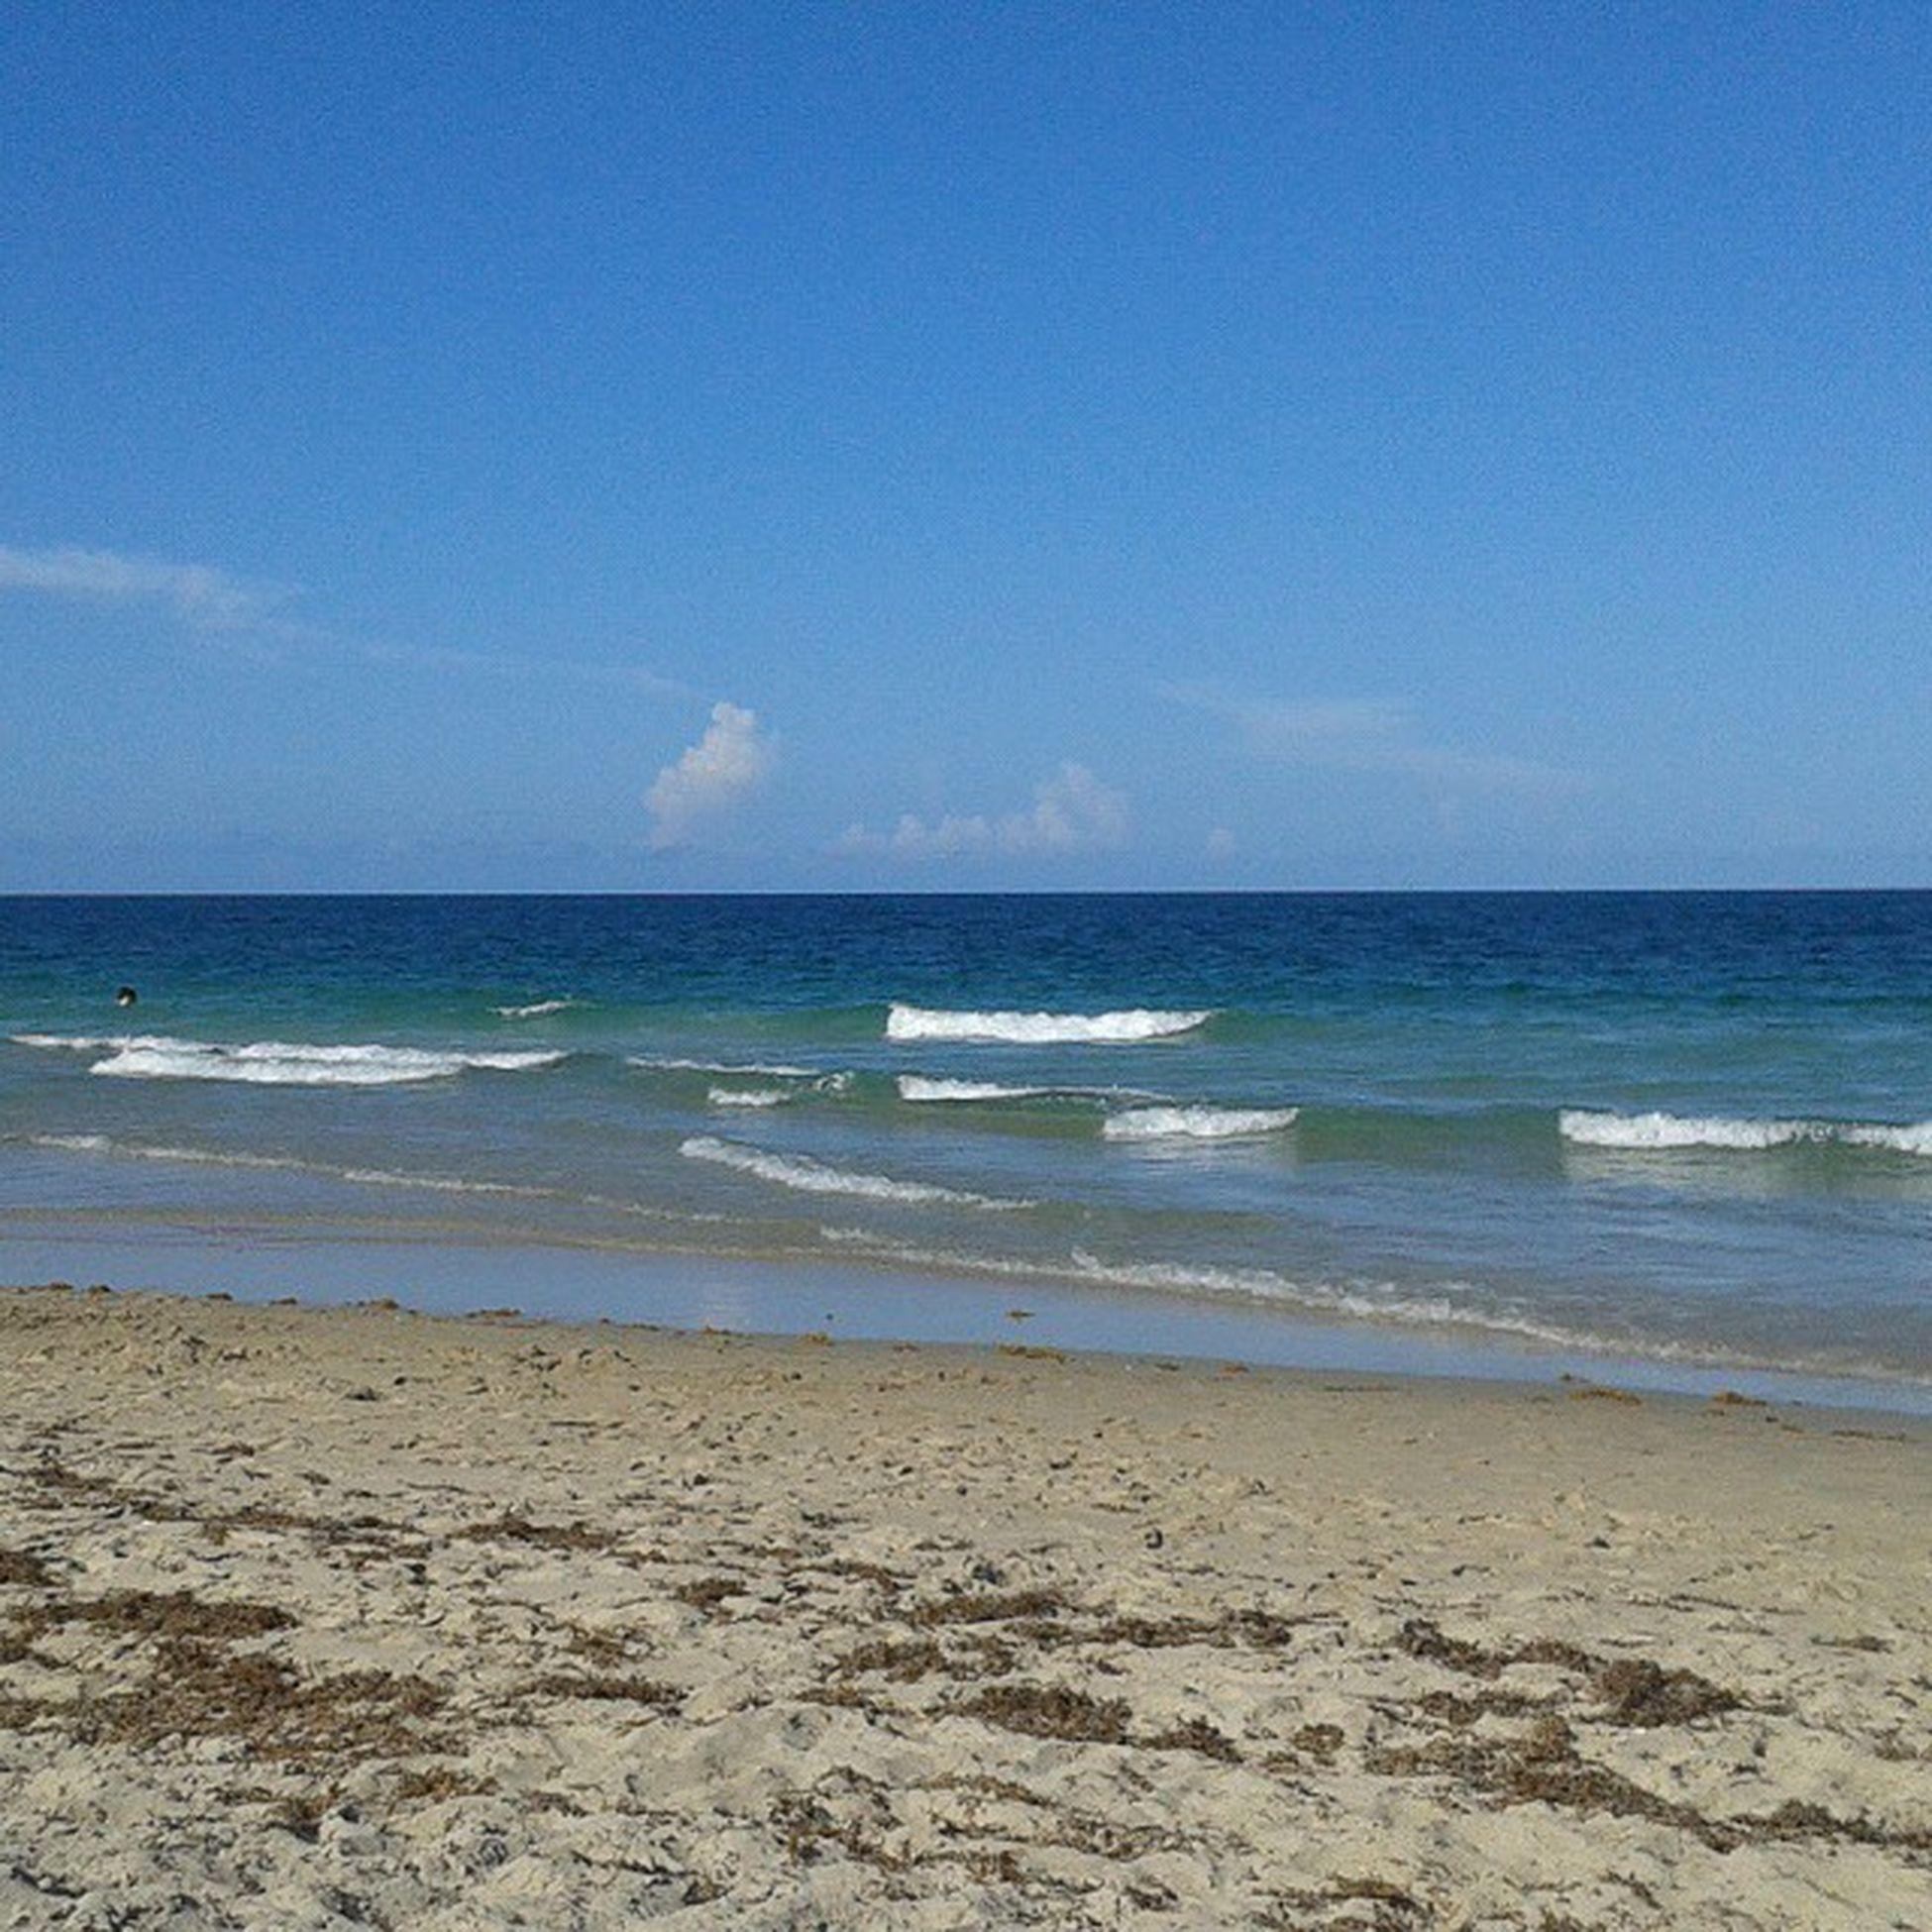 Oh how I missed you so much. My love! My escape! My serenity. Beach Beachlife Love Serenity Beautiful Peace Happiness Myexhale Thankful Blessed  LasOlas  Lasolasblvd Lasolasbeach